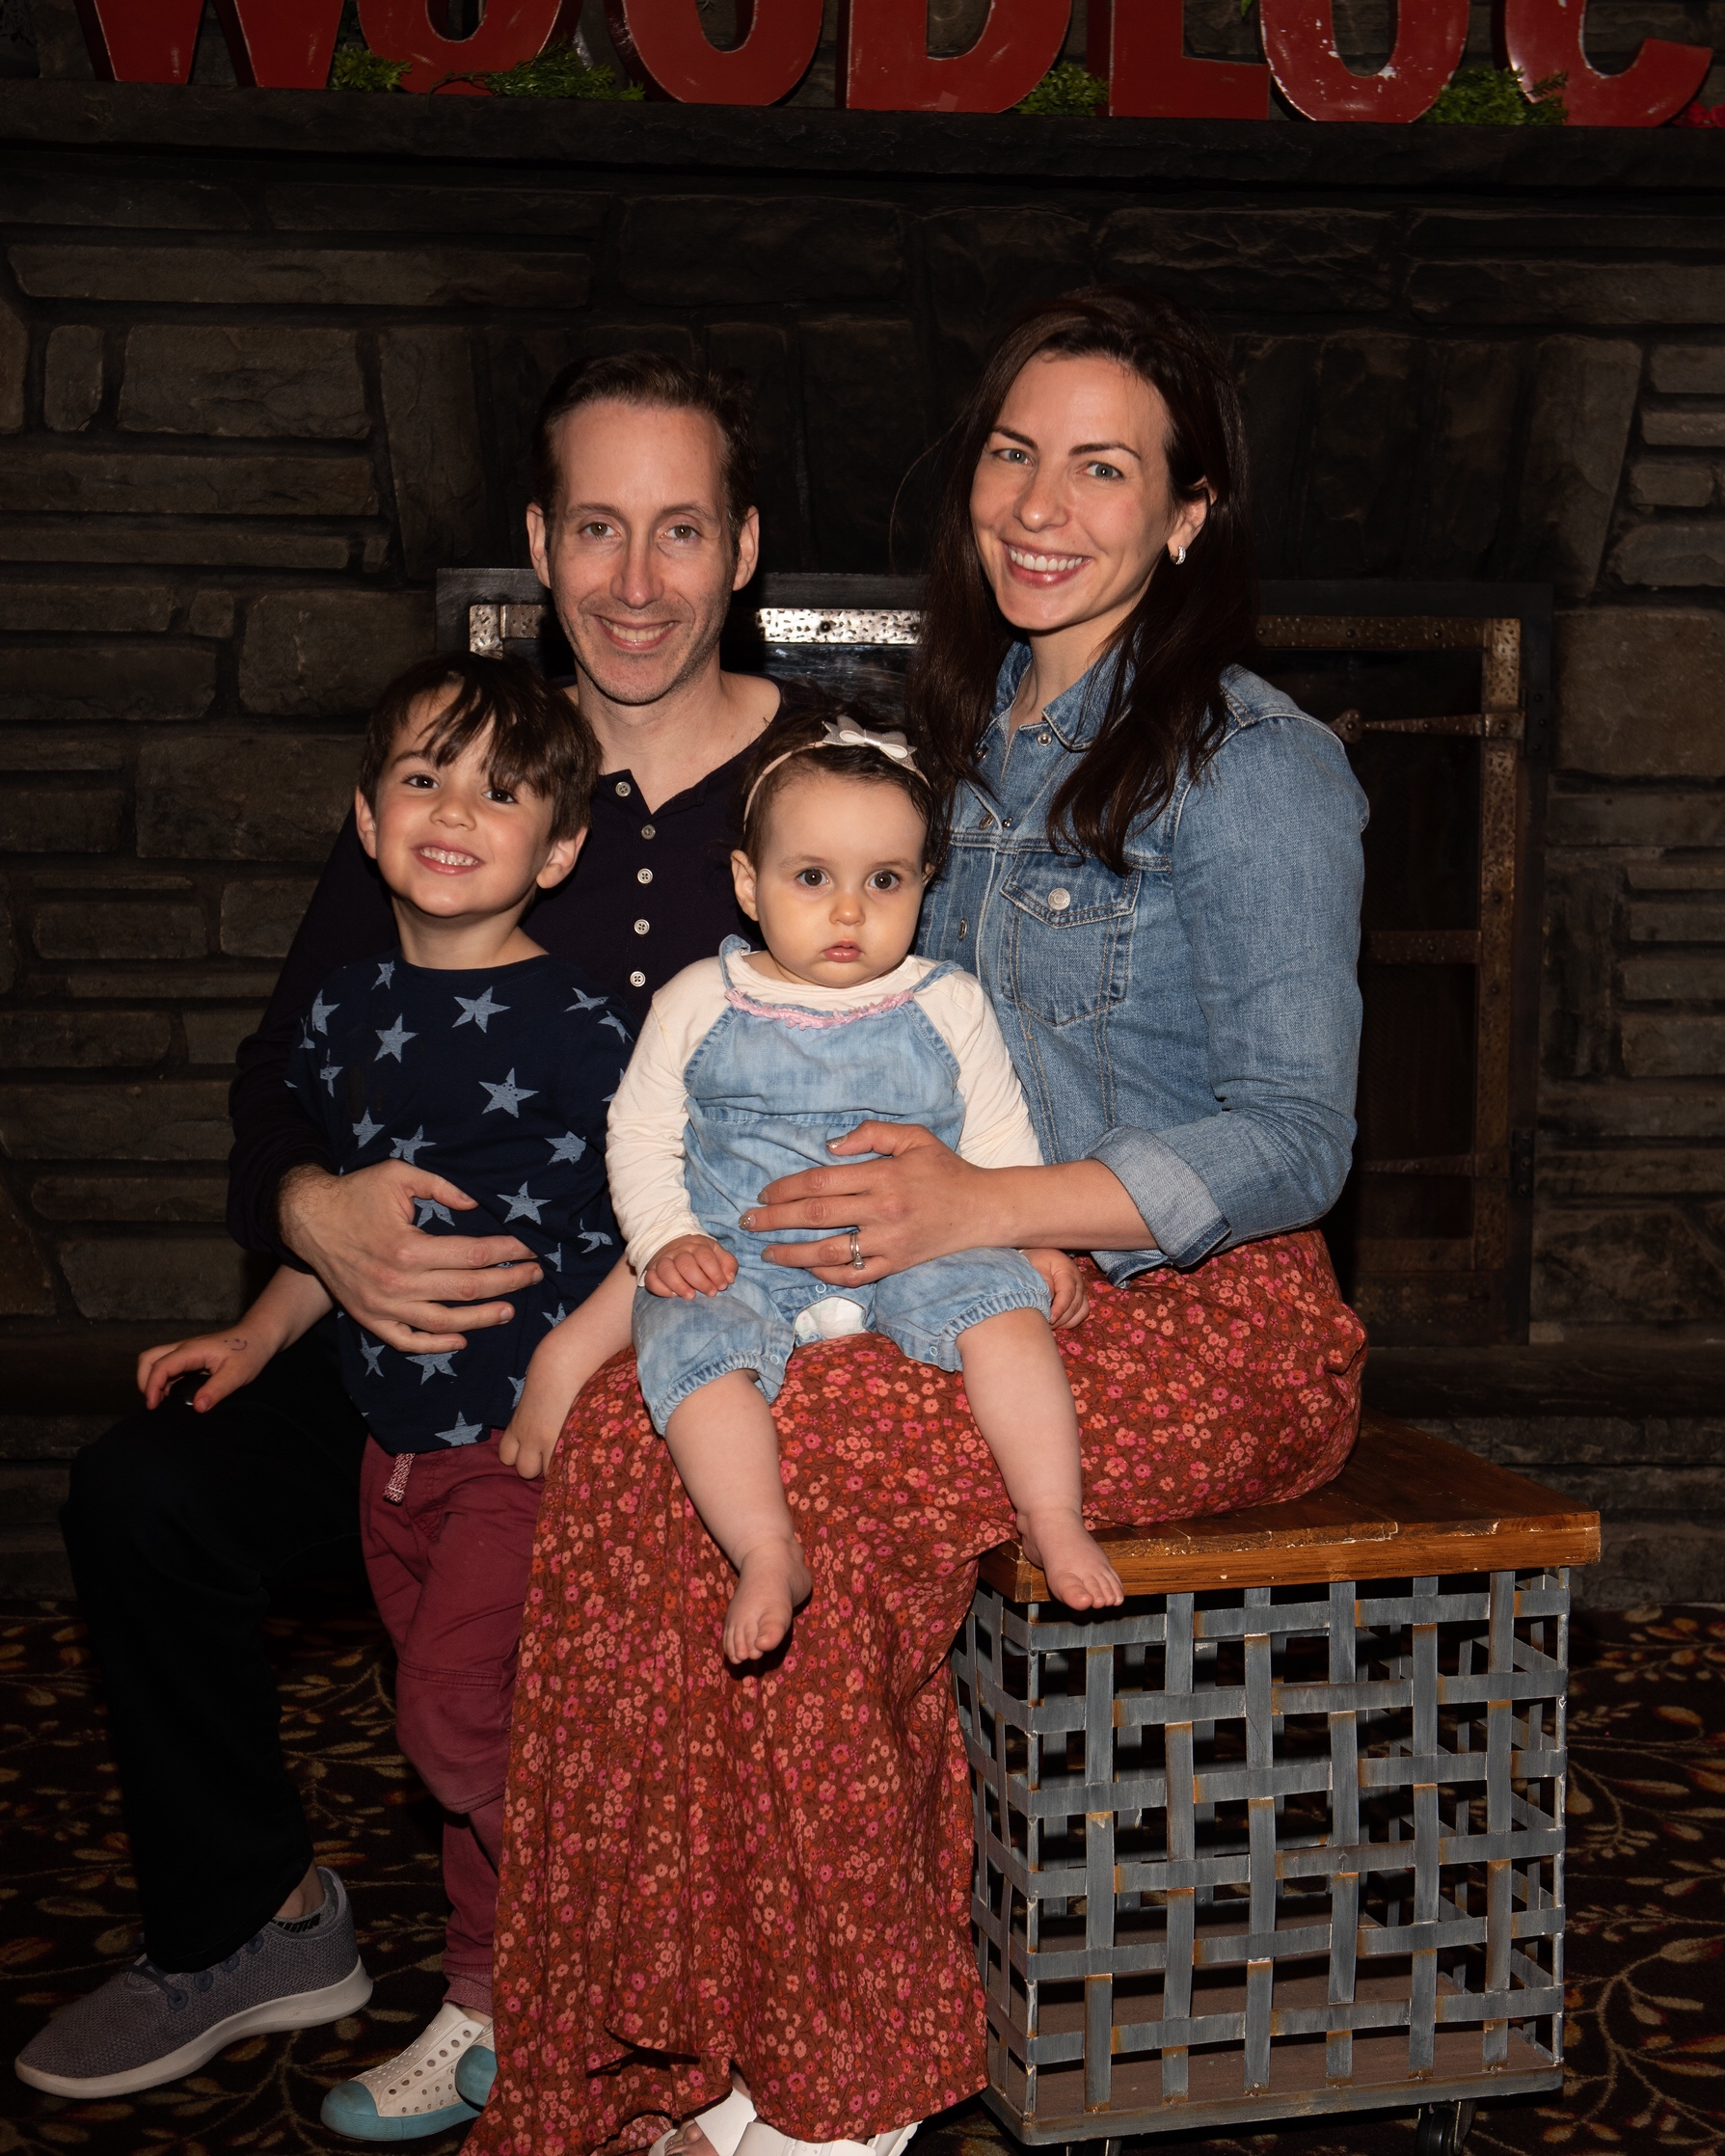 woodloch family theme night